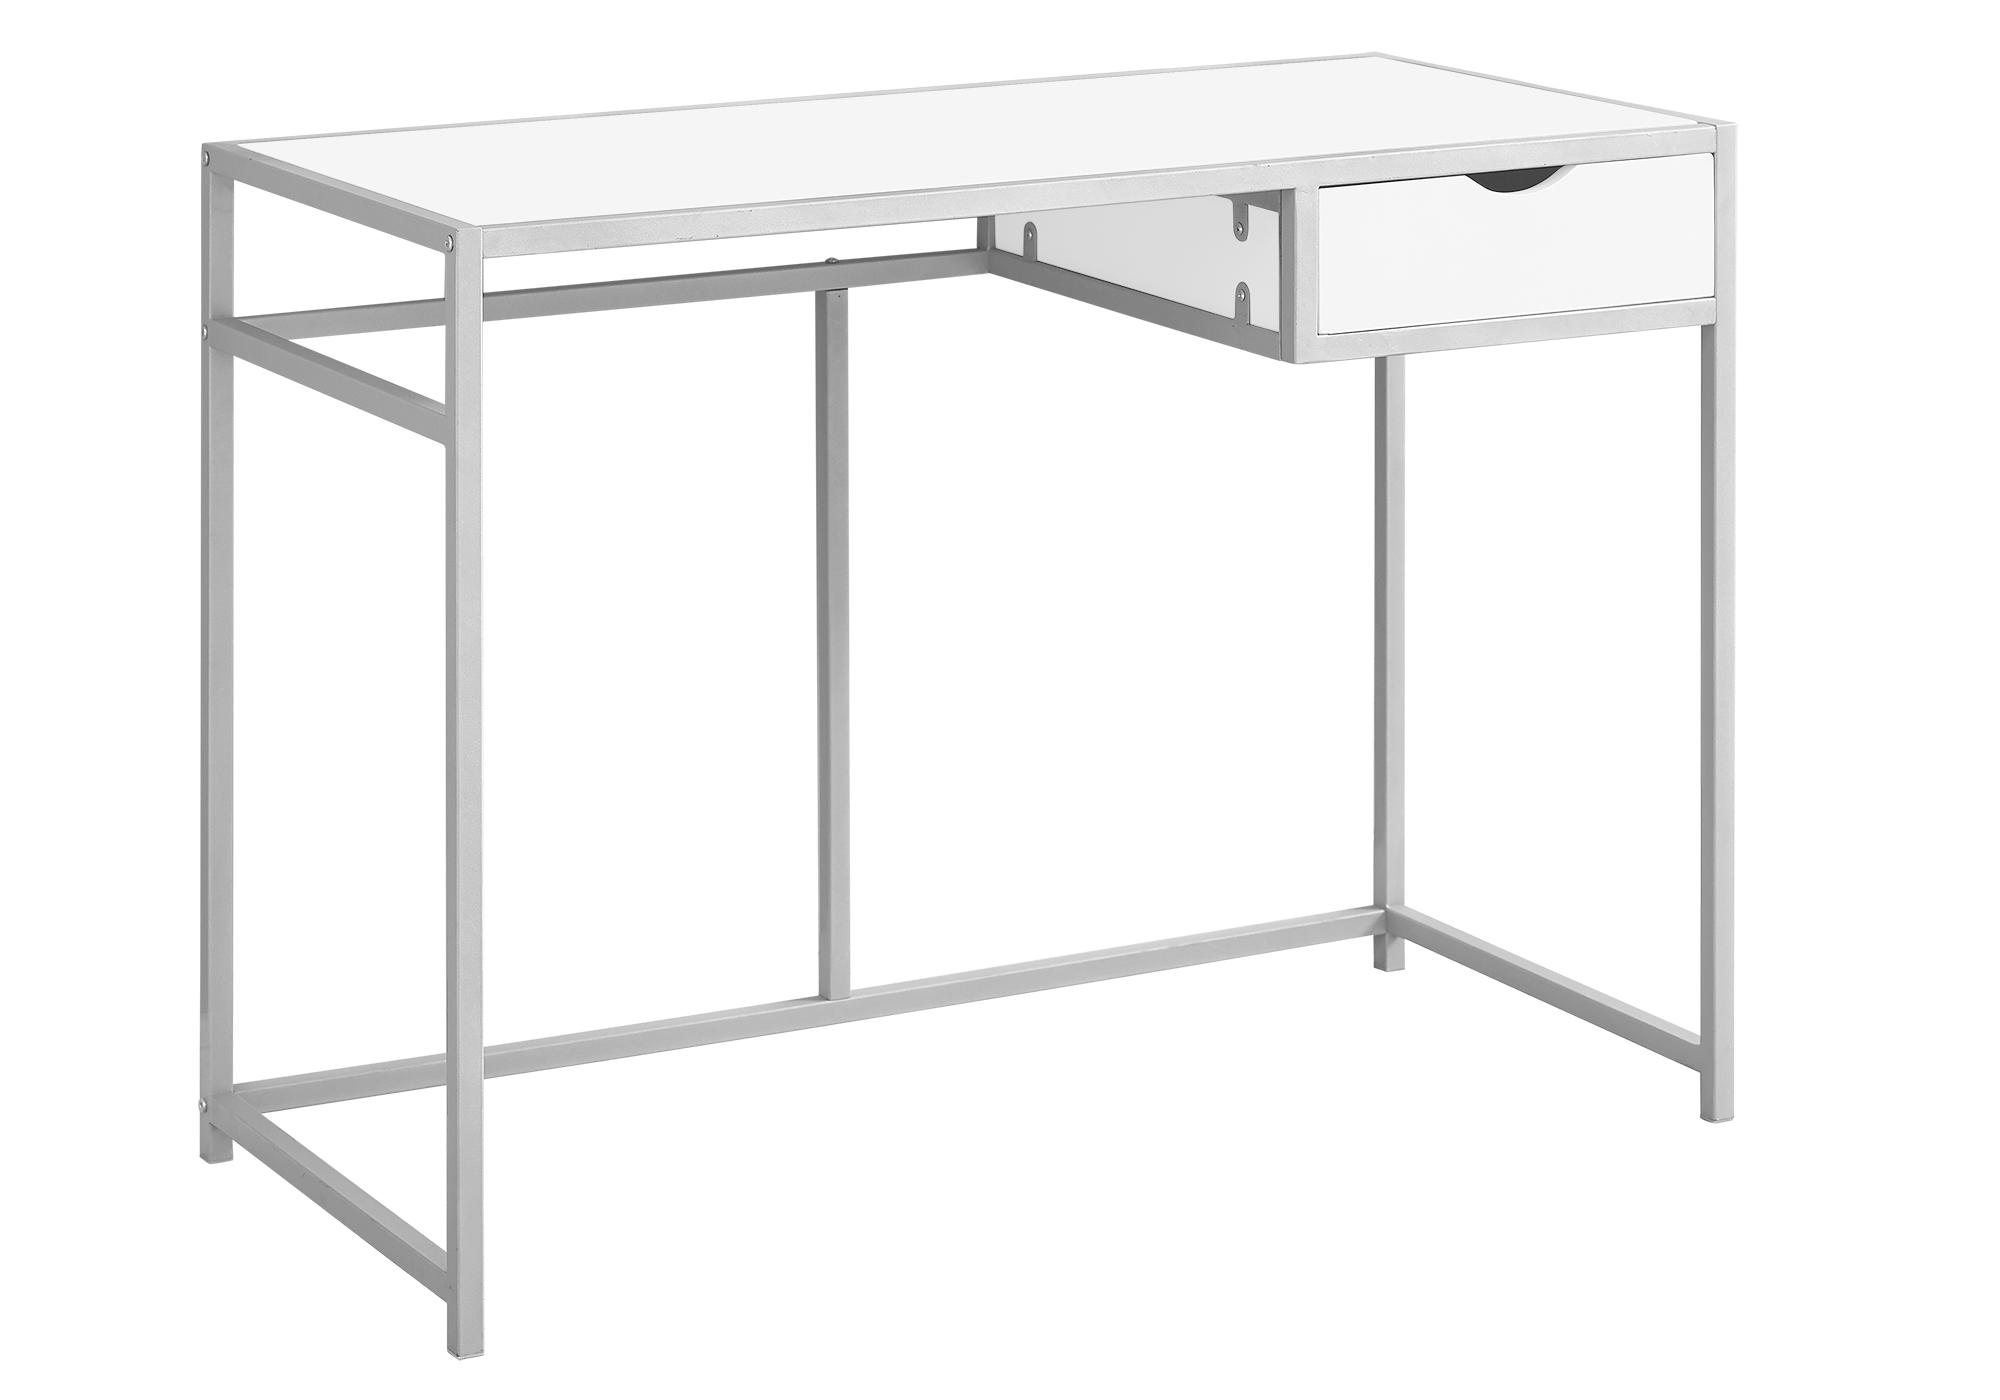 "20"" x 42.25"" x 30"" White Silver Mdf Metal  Computer Desk"